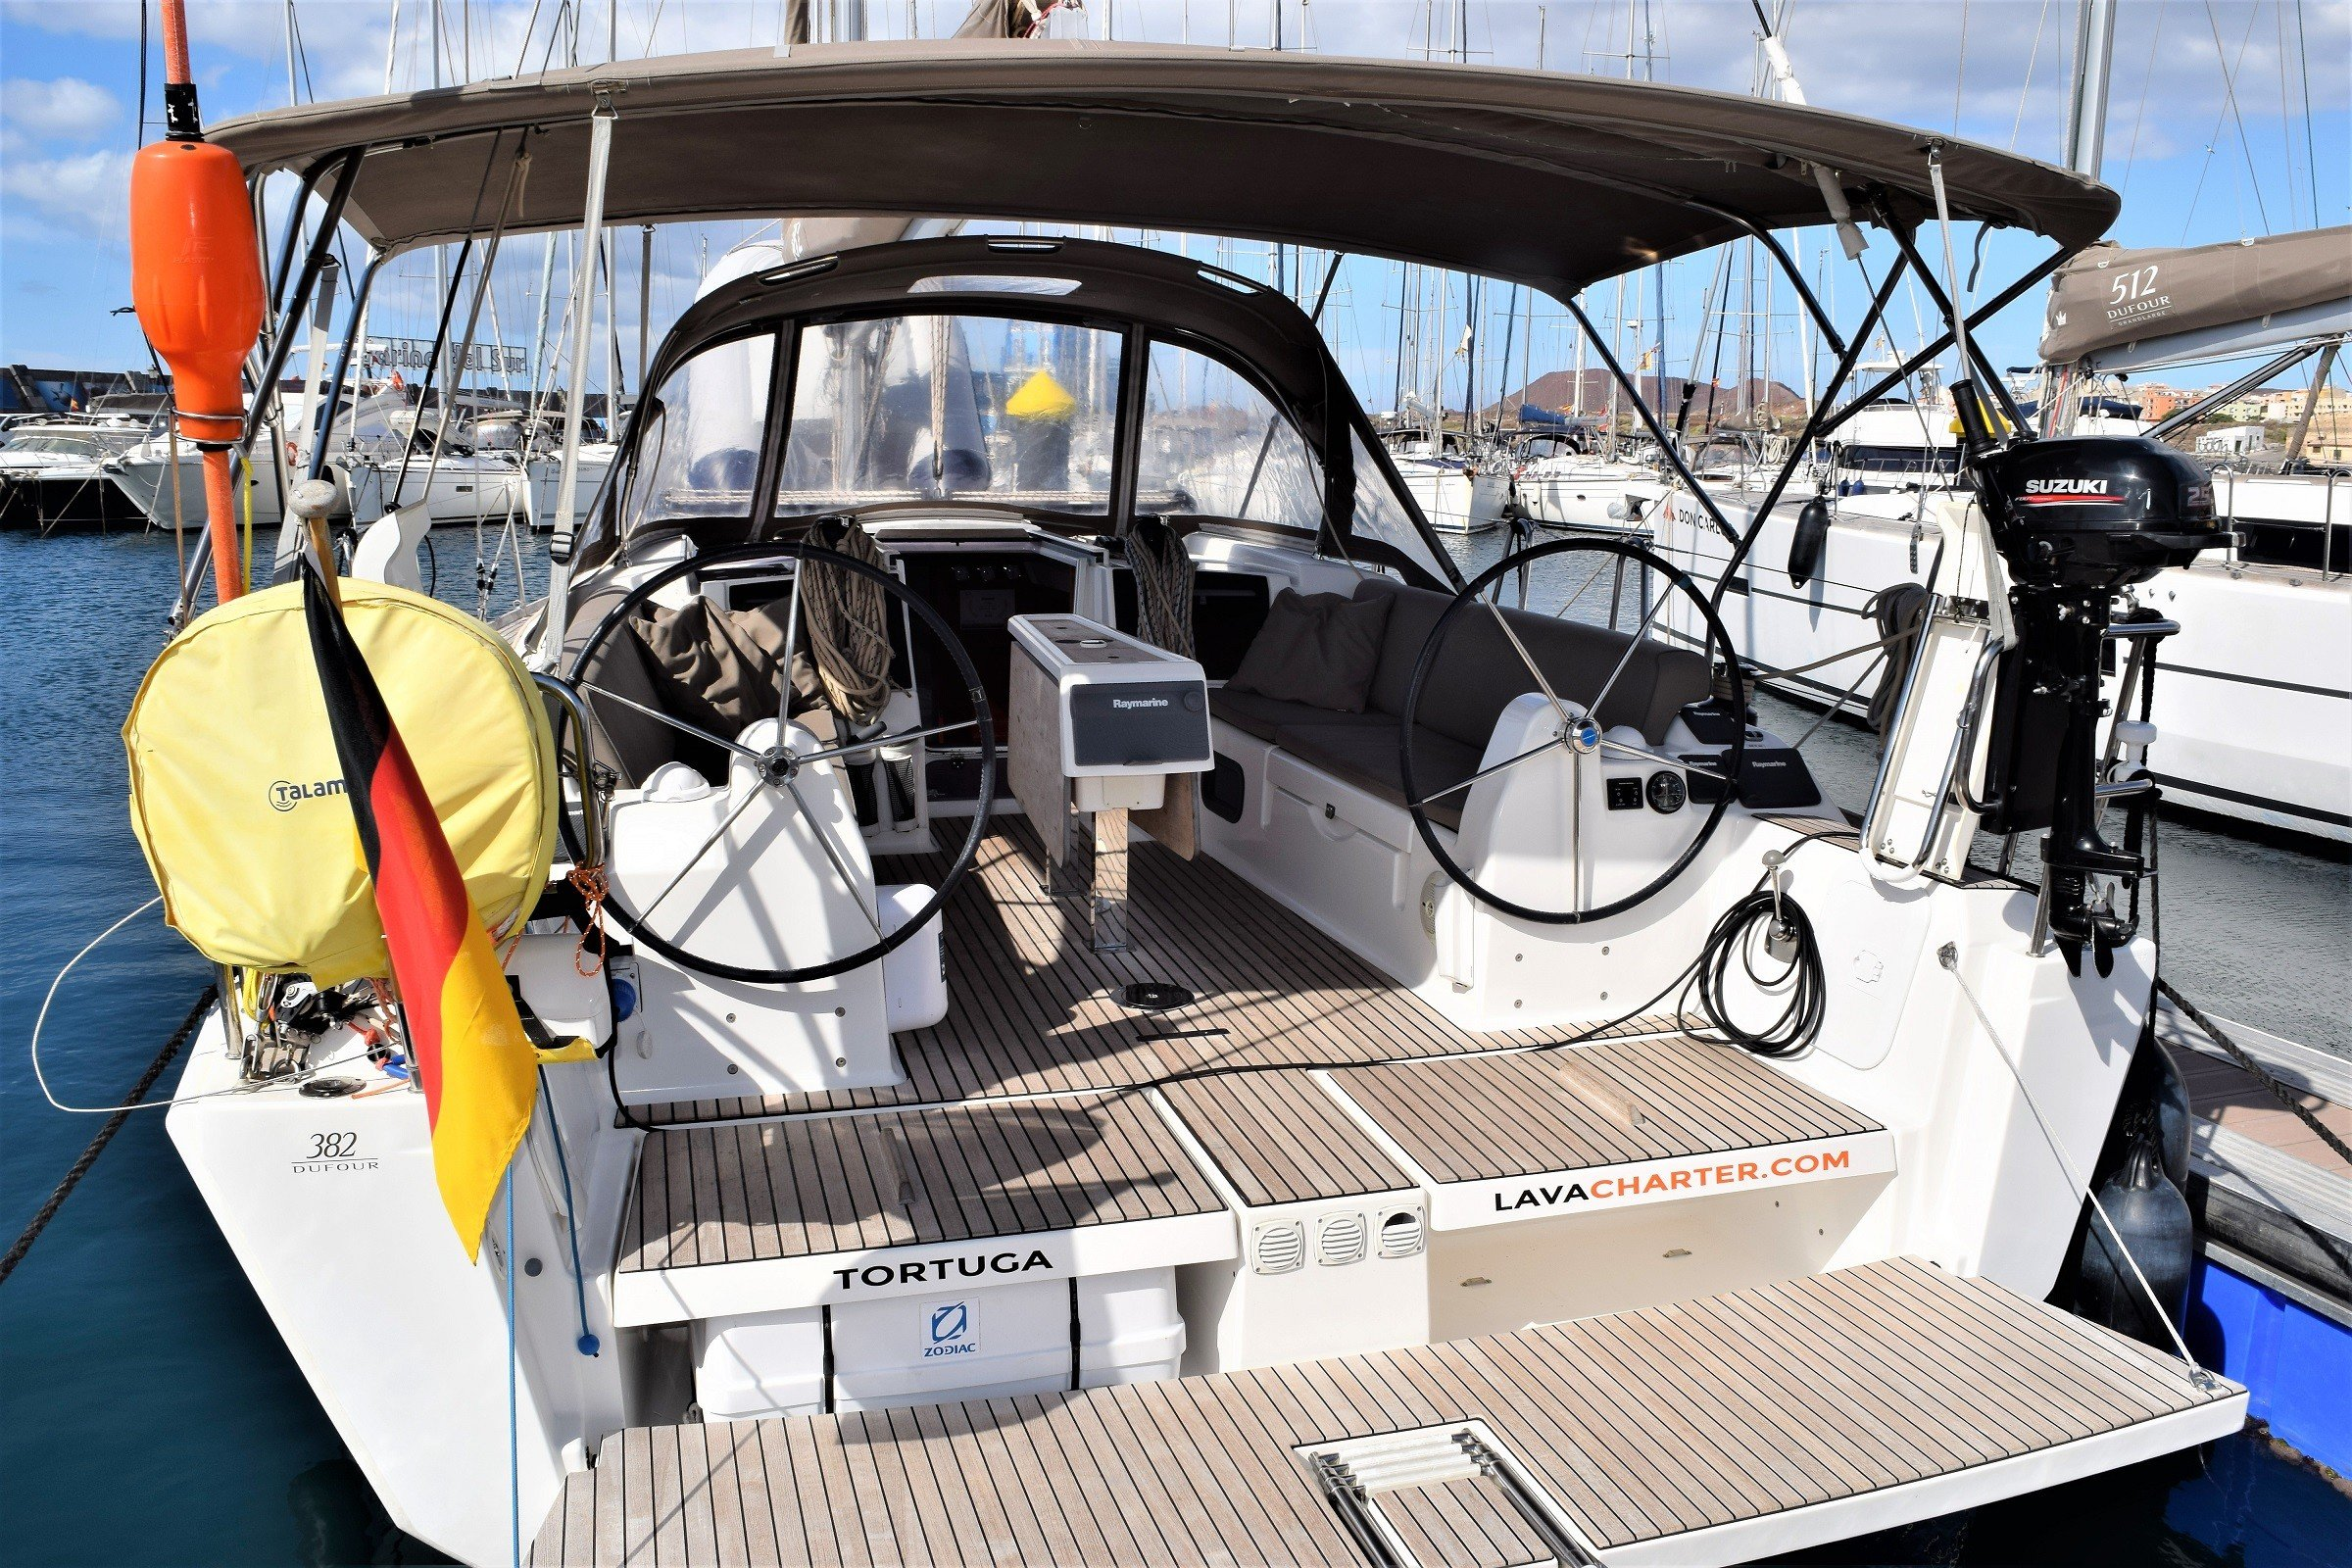 Dufour 382 GL Tortuga Marina Lanzarote Arrecife Canary Islands